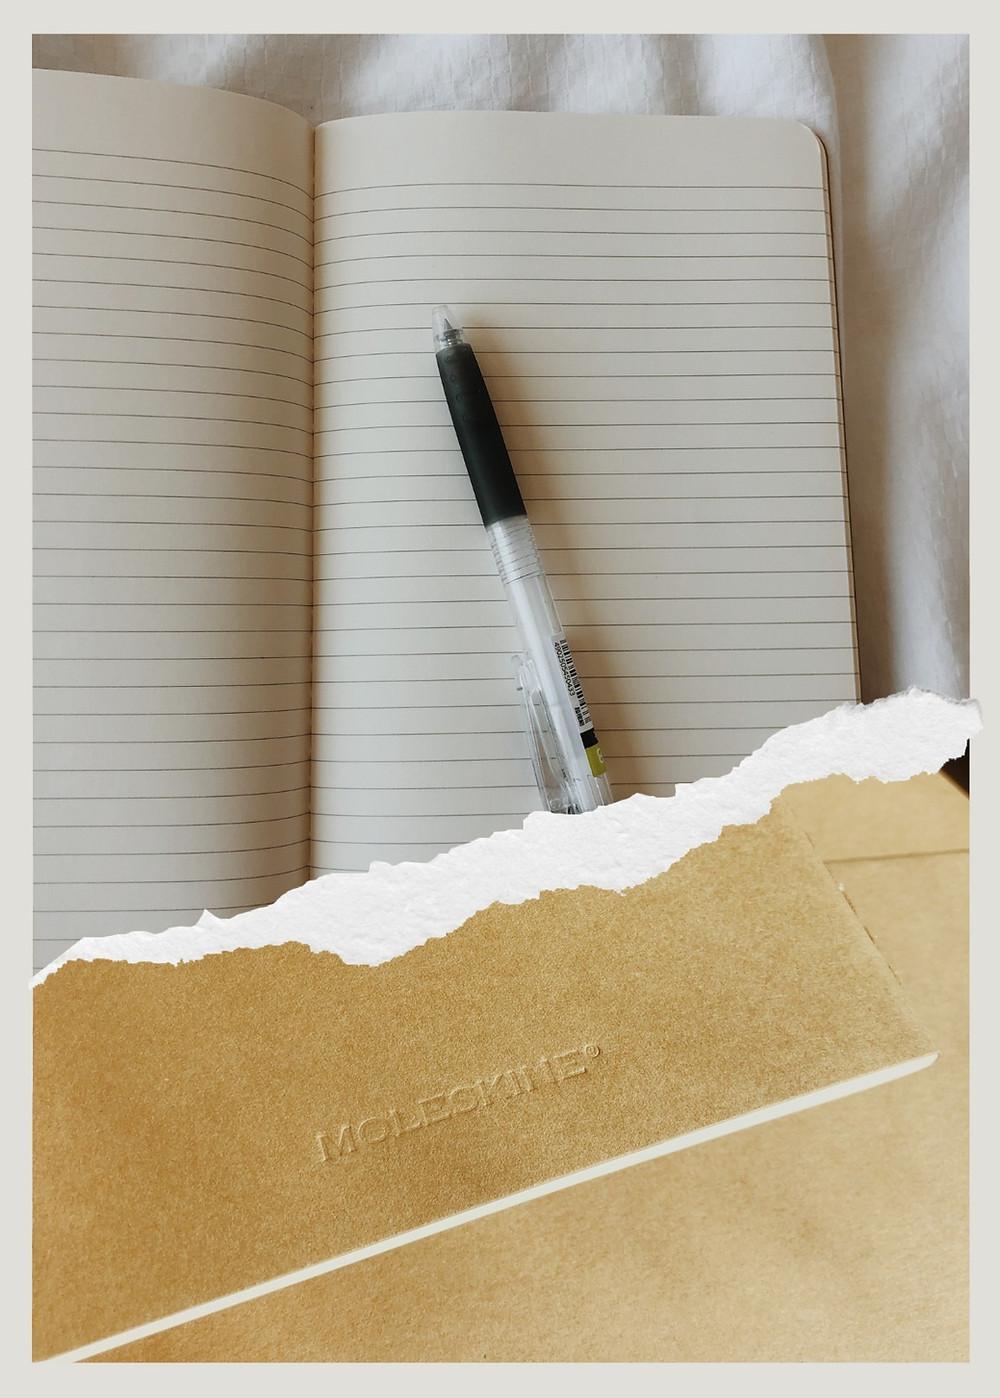 Moleskin journal, Pilot Juice 0.38 Pen, Journaling, Daily Journaling, Gratitude, Writing, Lined Paper, Kraft Brown Journal